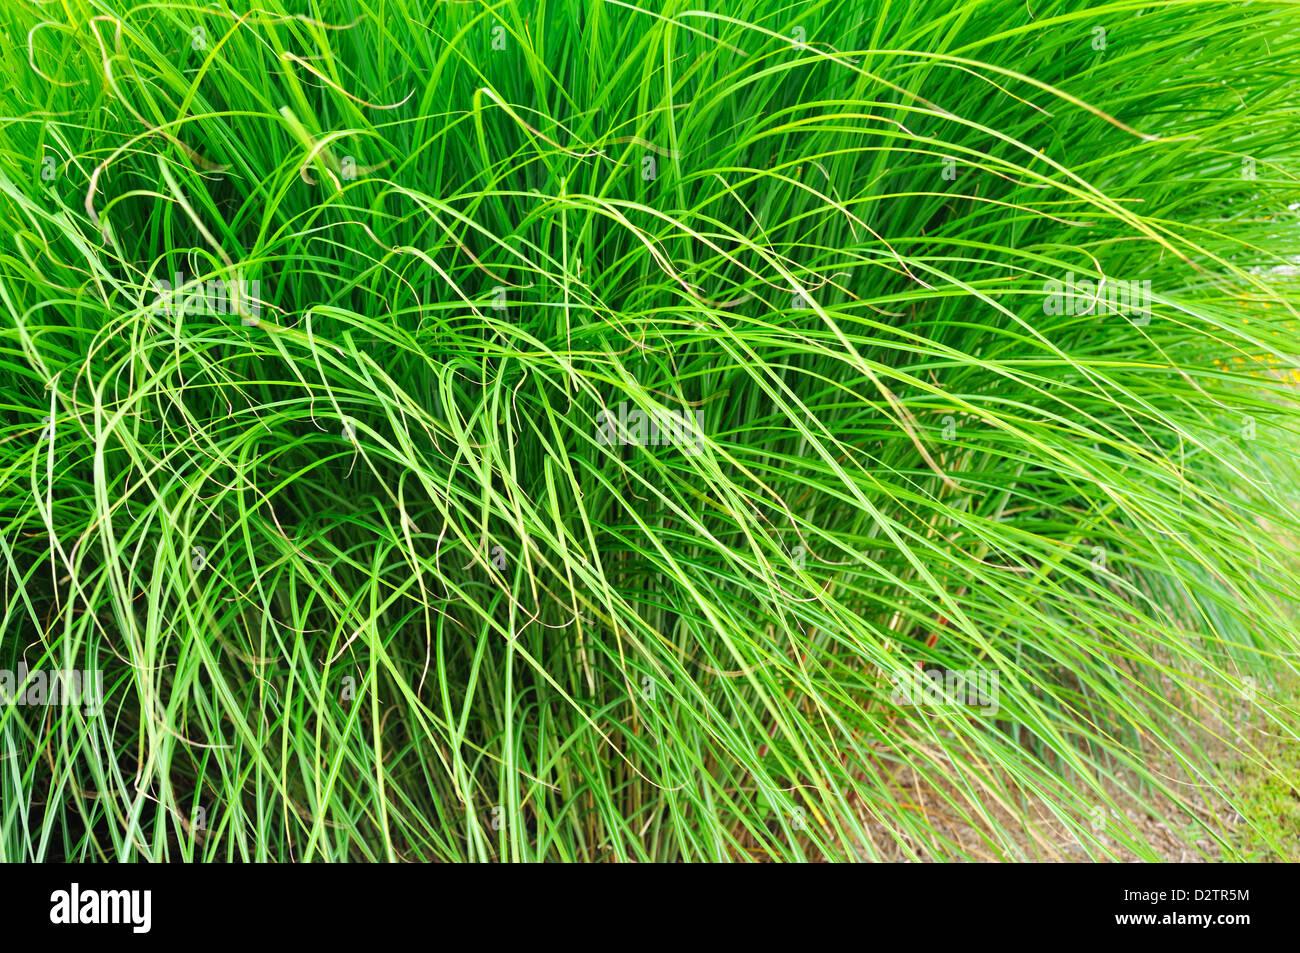 Tall Decorative Grass Tall Ornamental Grass Stock Photo Royalty Free Image 53405456